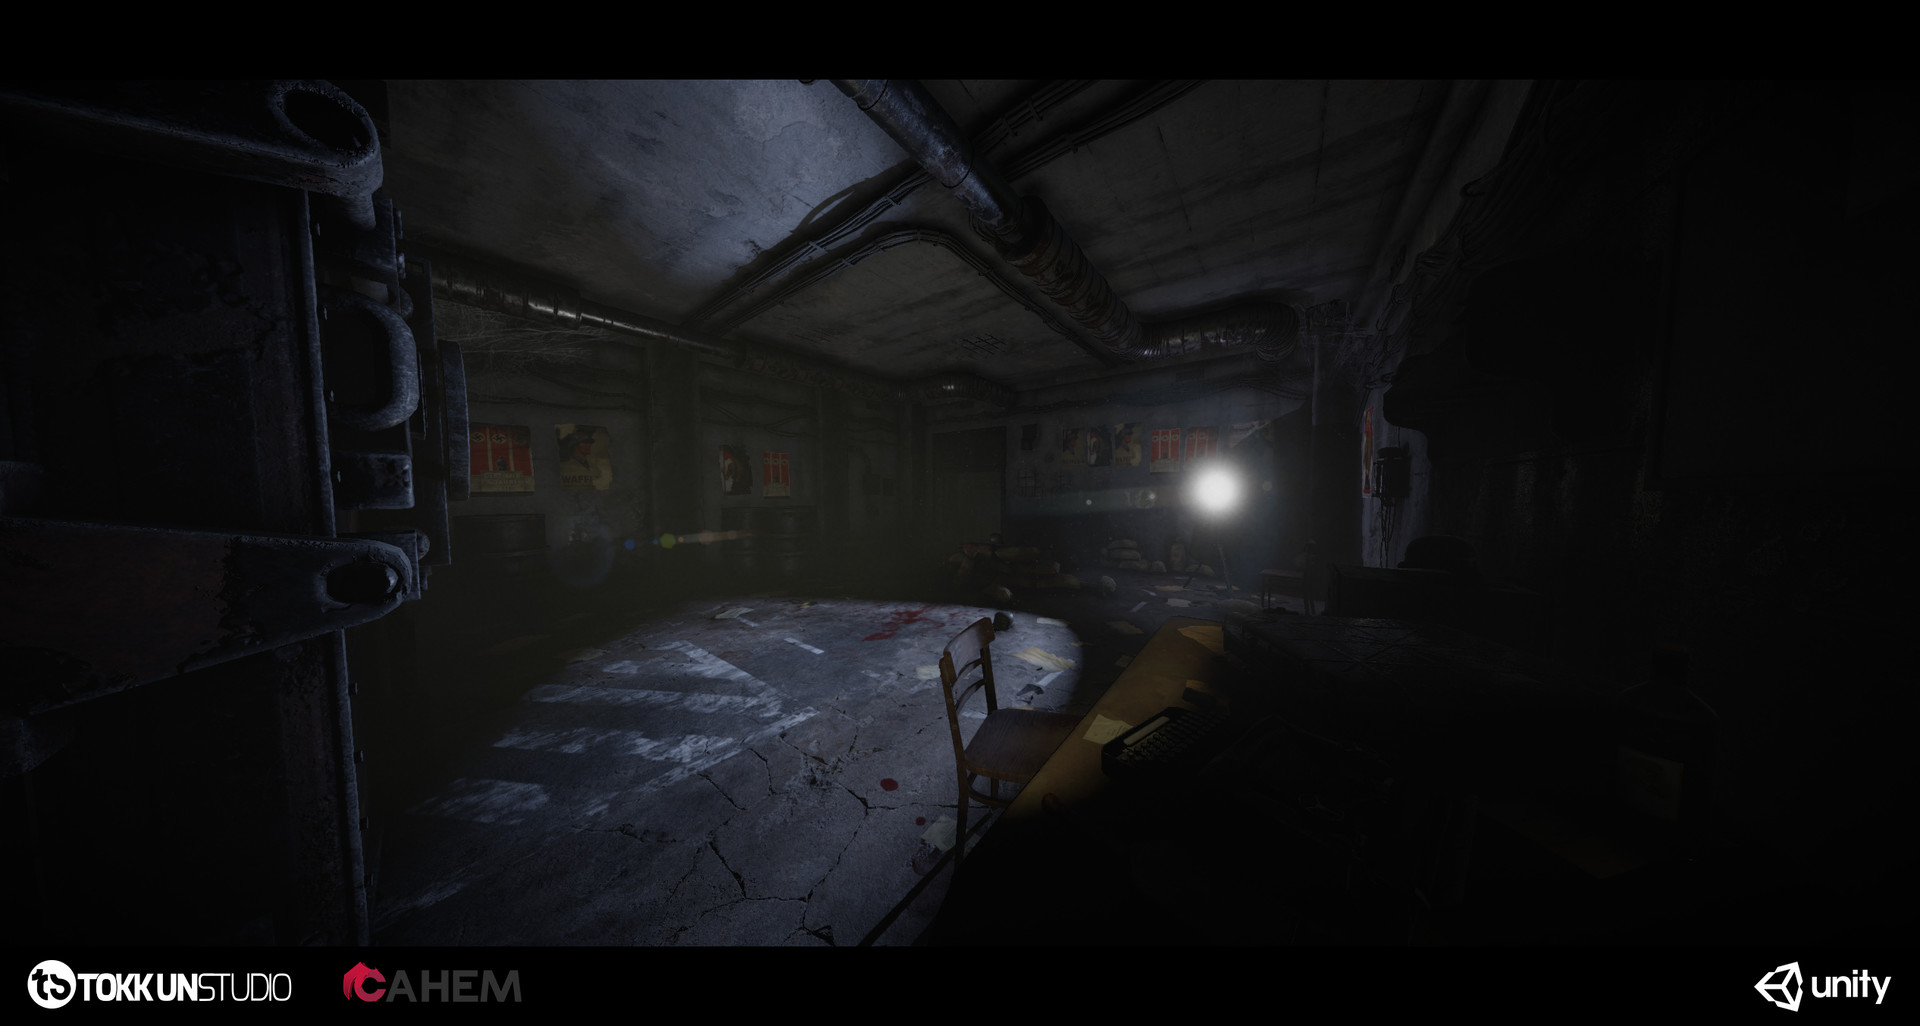 Tokkun studio bunker shot 33